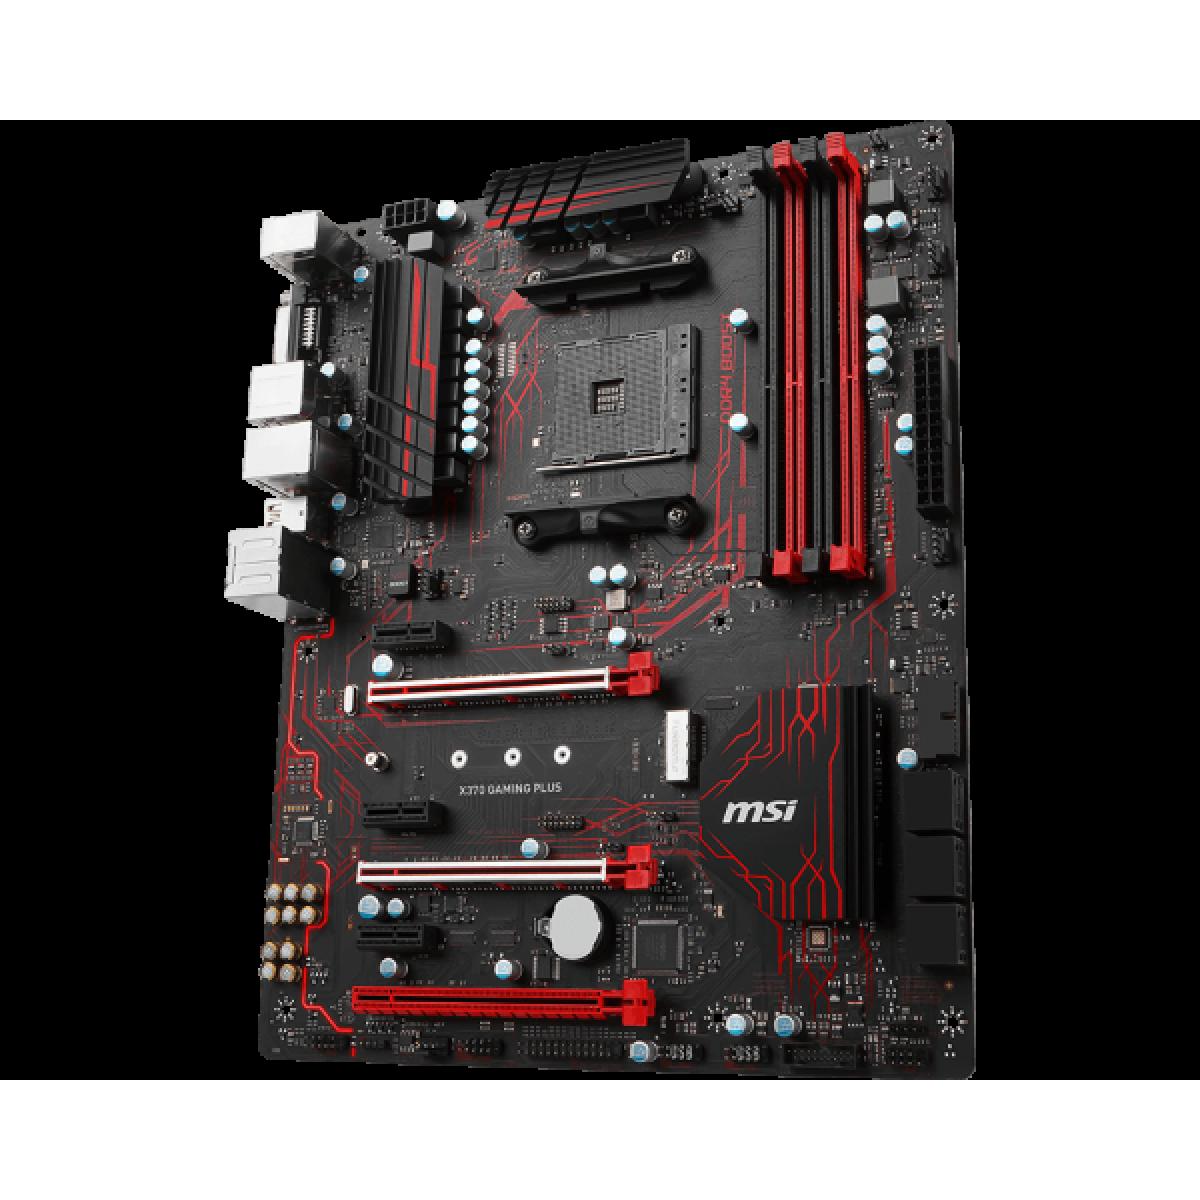 Placa Mãe MSI X370 GAMING PLUS, Chipset X370, AMD AM4, ATX, DDR4